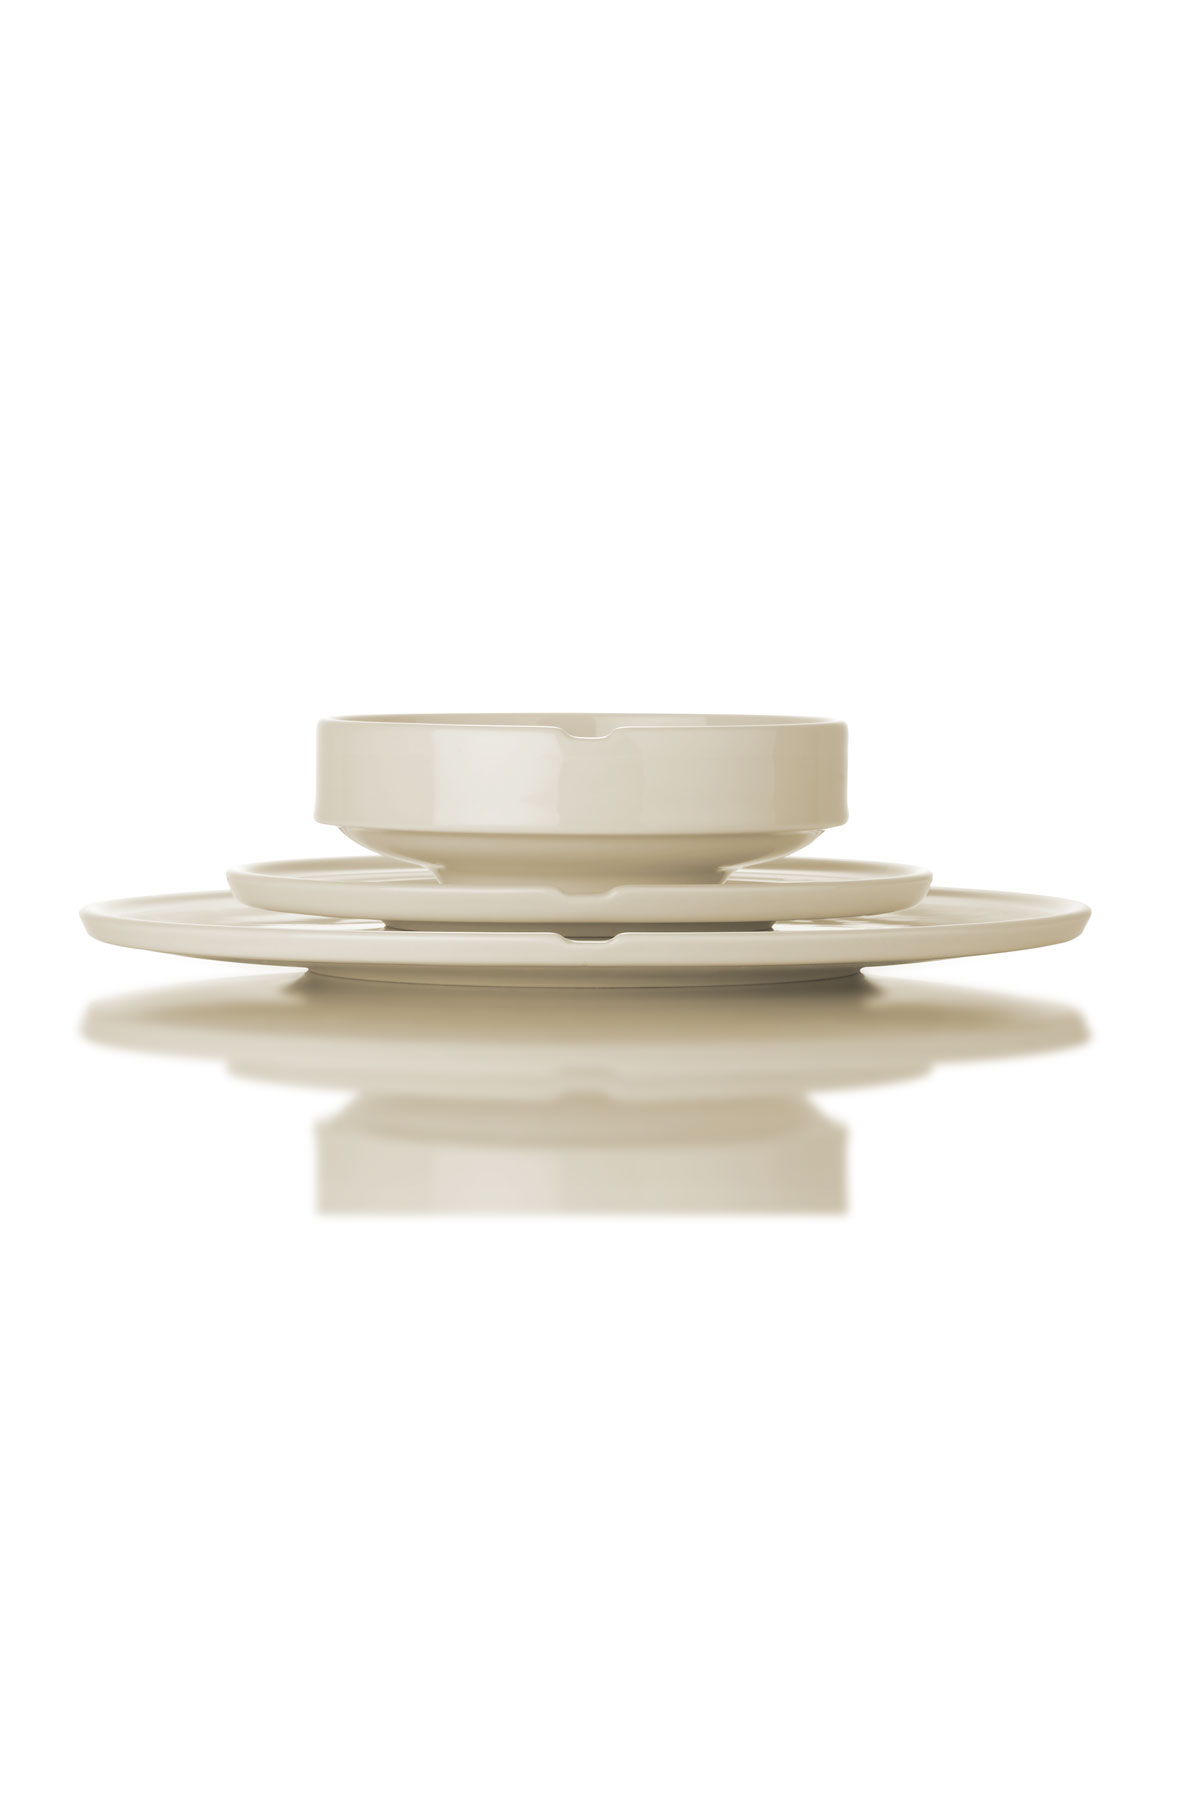 Kütahya Porselen Chef Taste Of 12 cm Joker Kase Krem